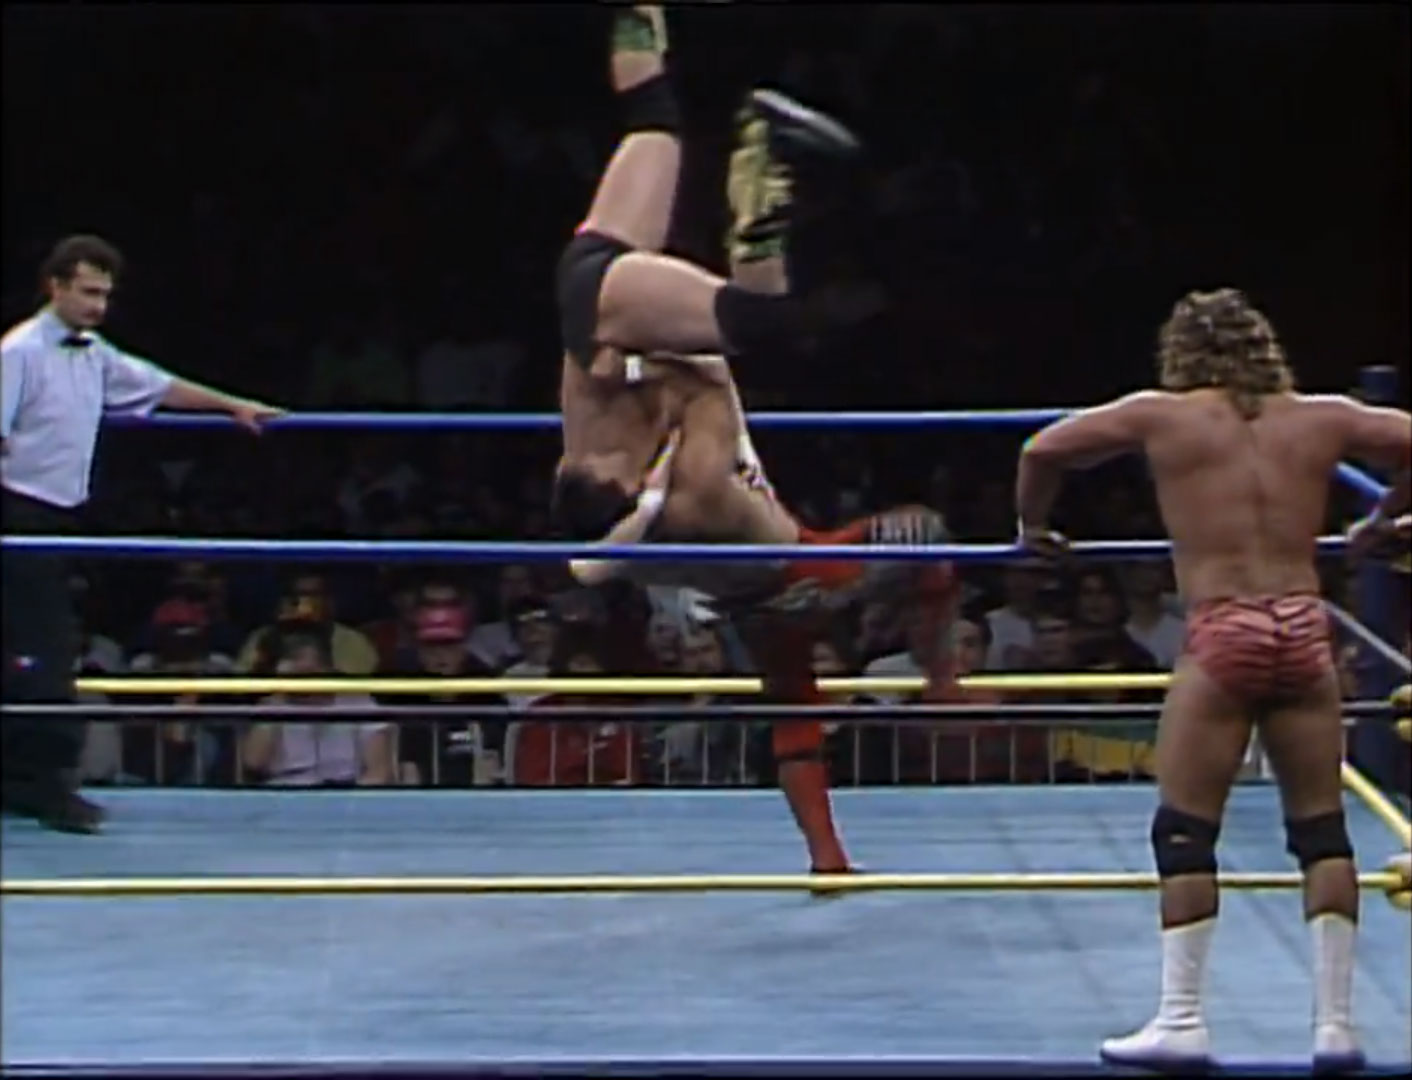 Ricky Steamboat & Shane Douglas vs. Barry Windham & Brian Pillman NWA Tag Team Titles, WCW World Tag Team Titles WCW StarrCade '92, Dec 28th 1992